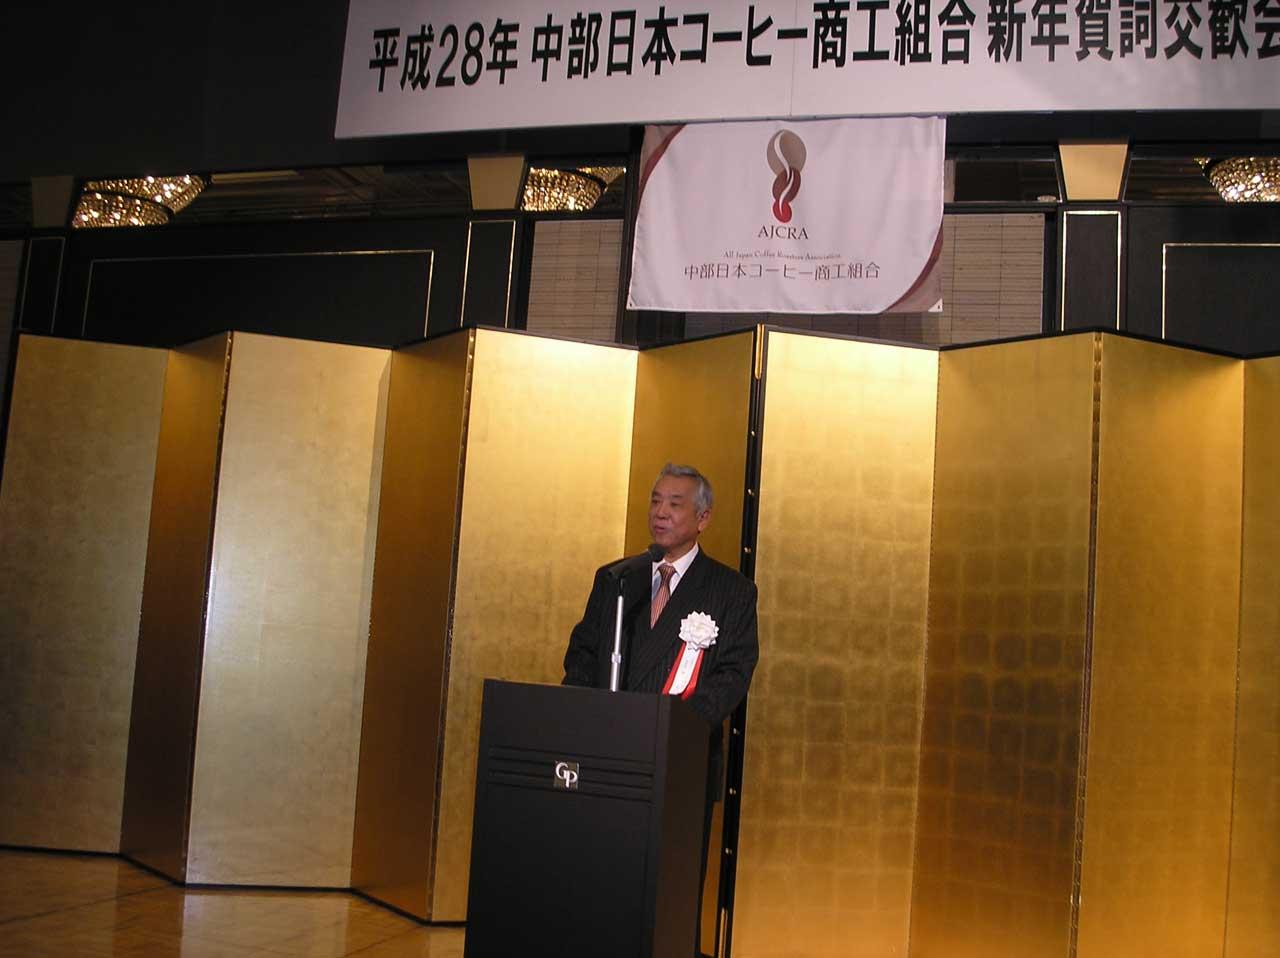 当組合の伊藤太一理事長の挨拶